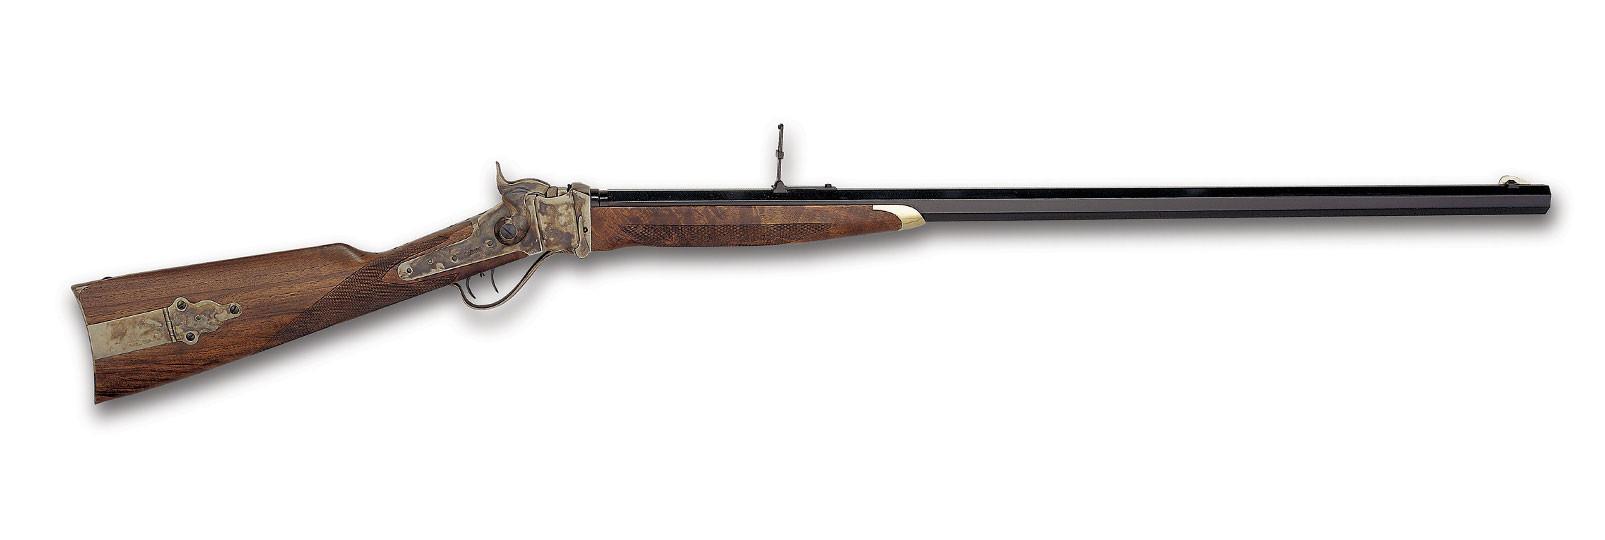 1874 & 1877 Sharps